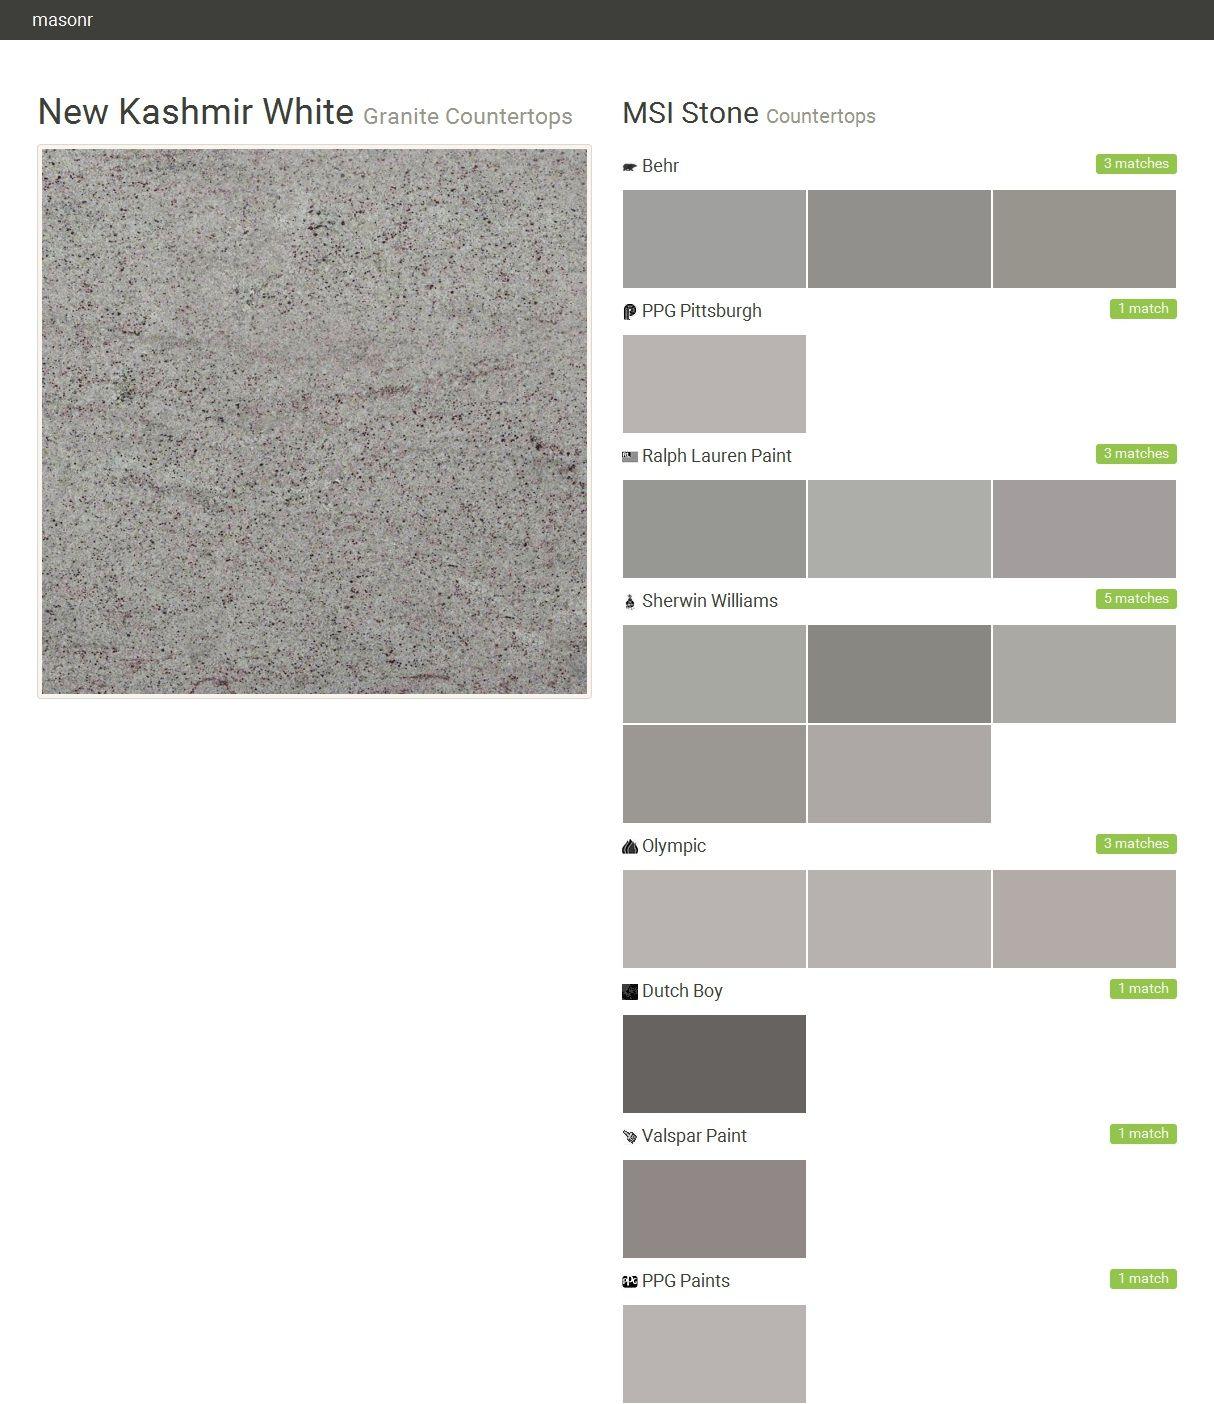 New Kashmir White. Granite Countertops. Countertops. MSI Stone. Behr. PPG  Pittsburgh